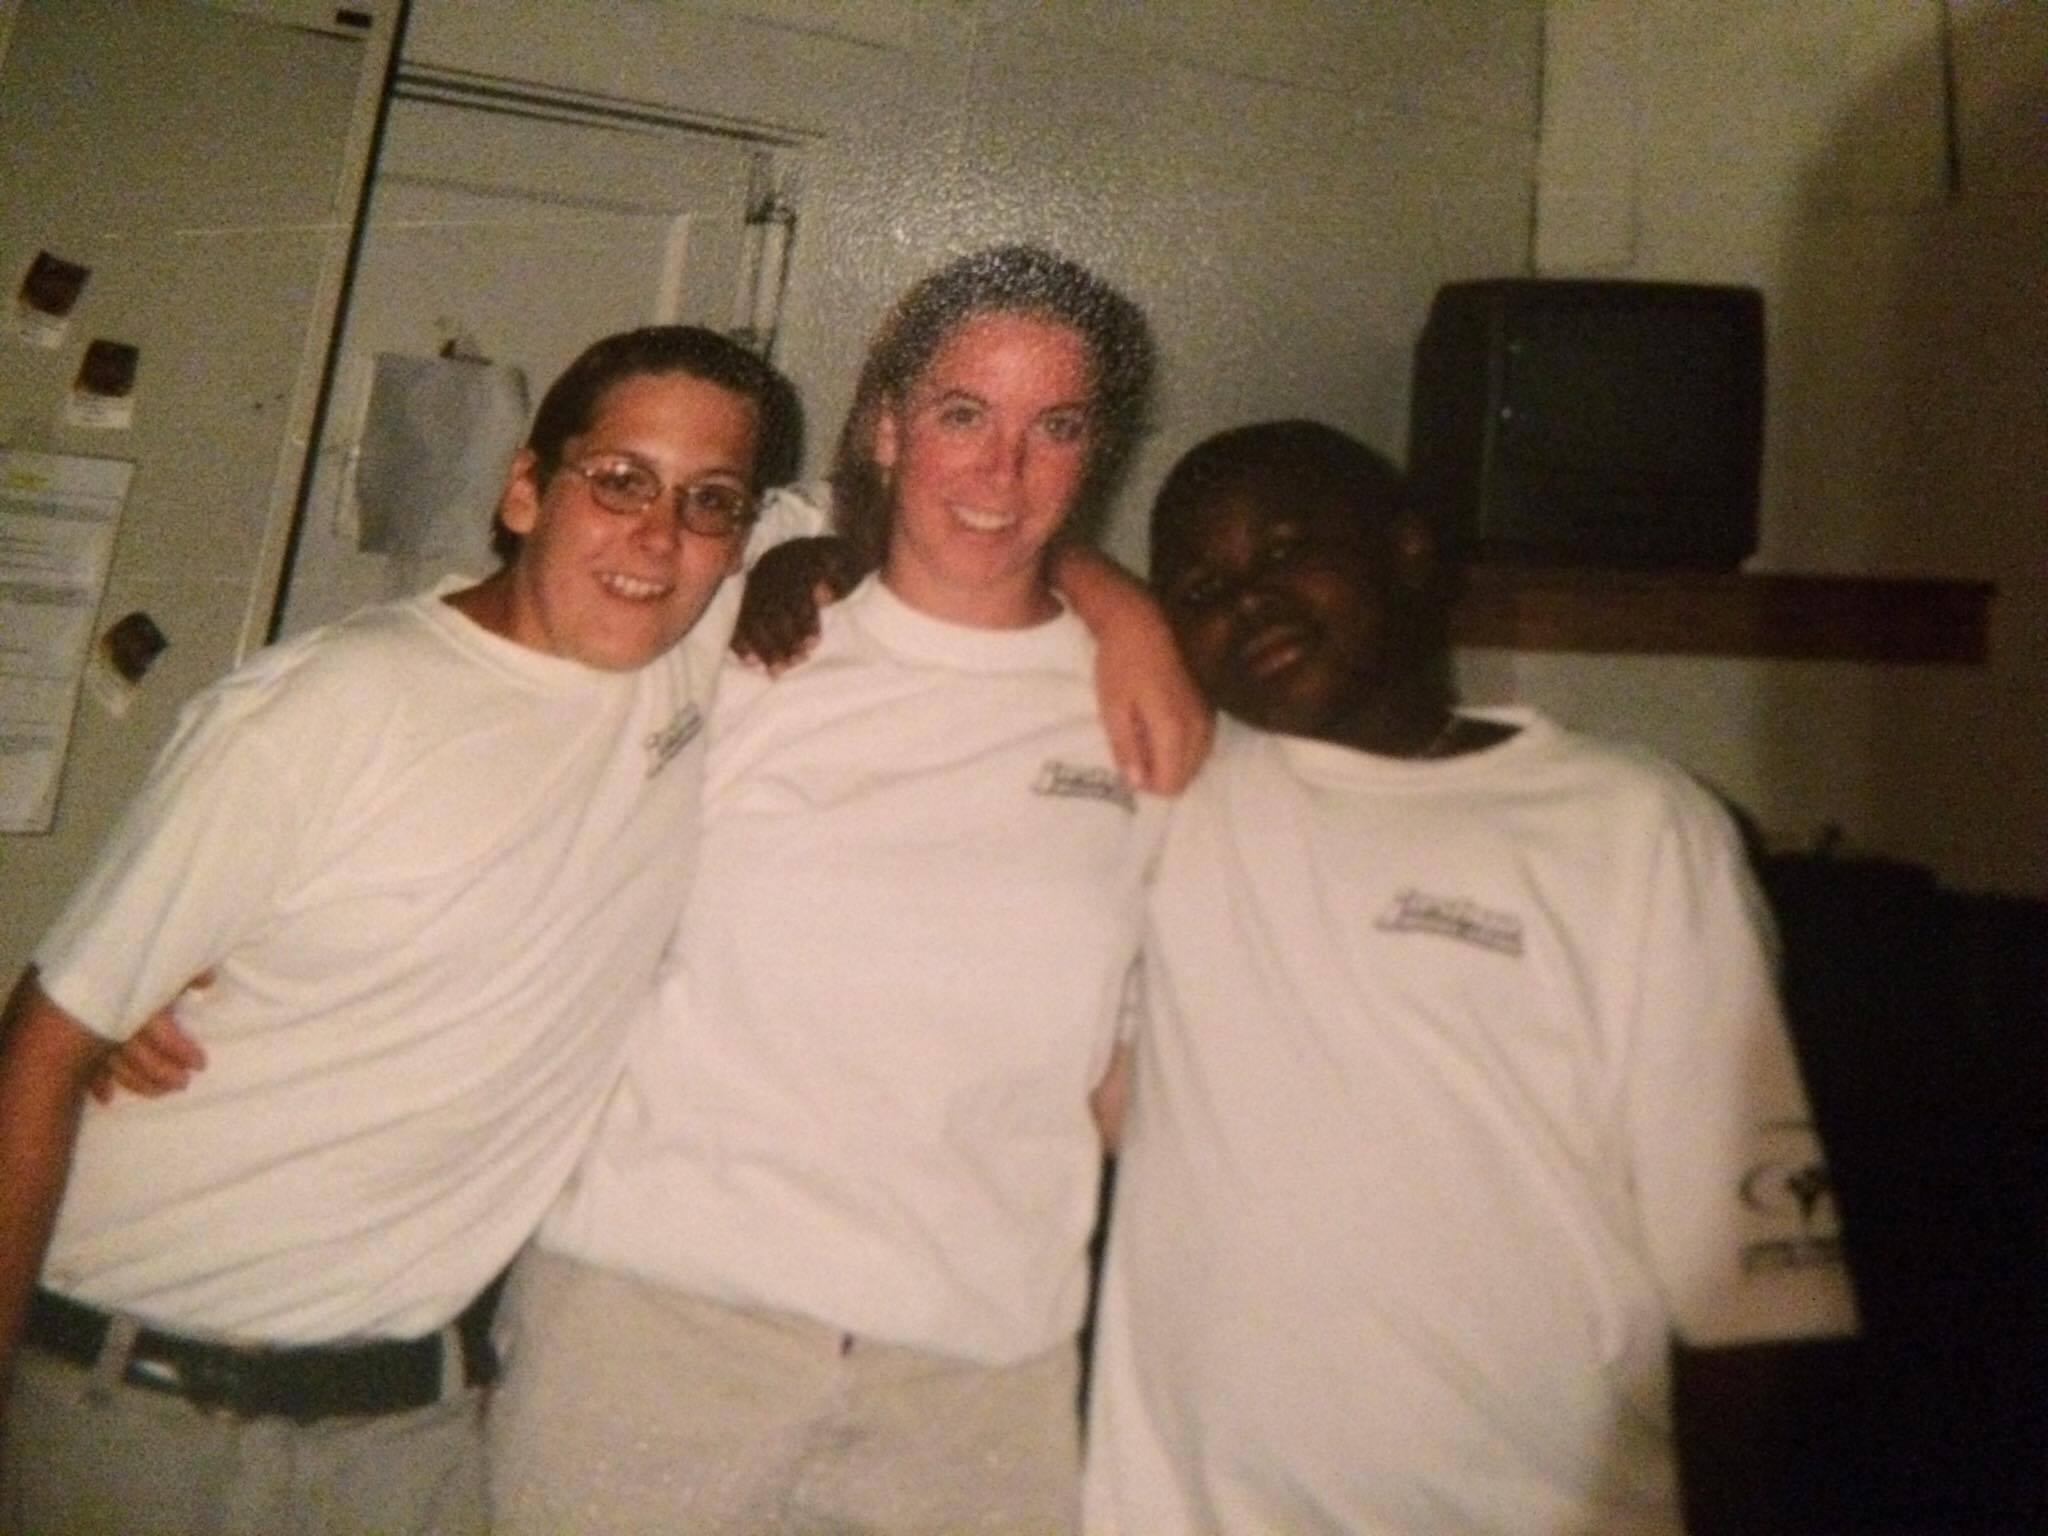 Deo at JG in 2002